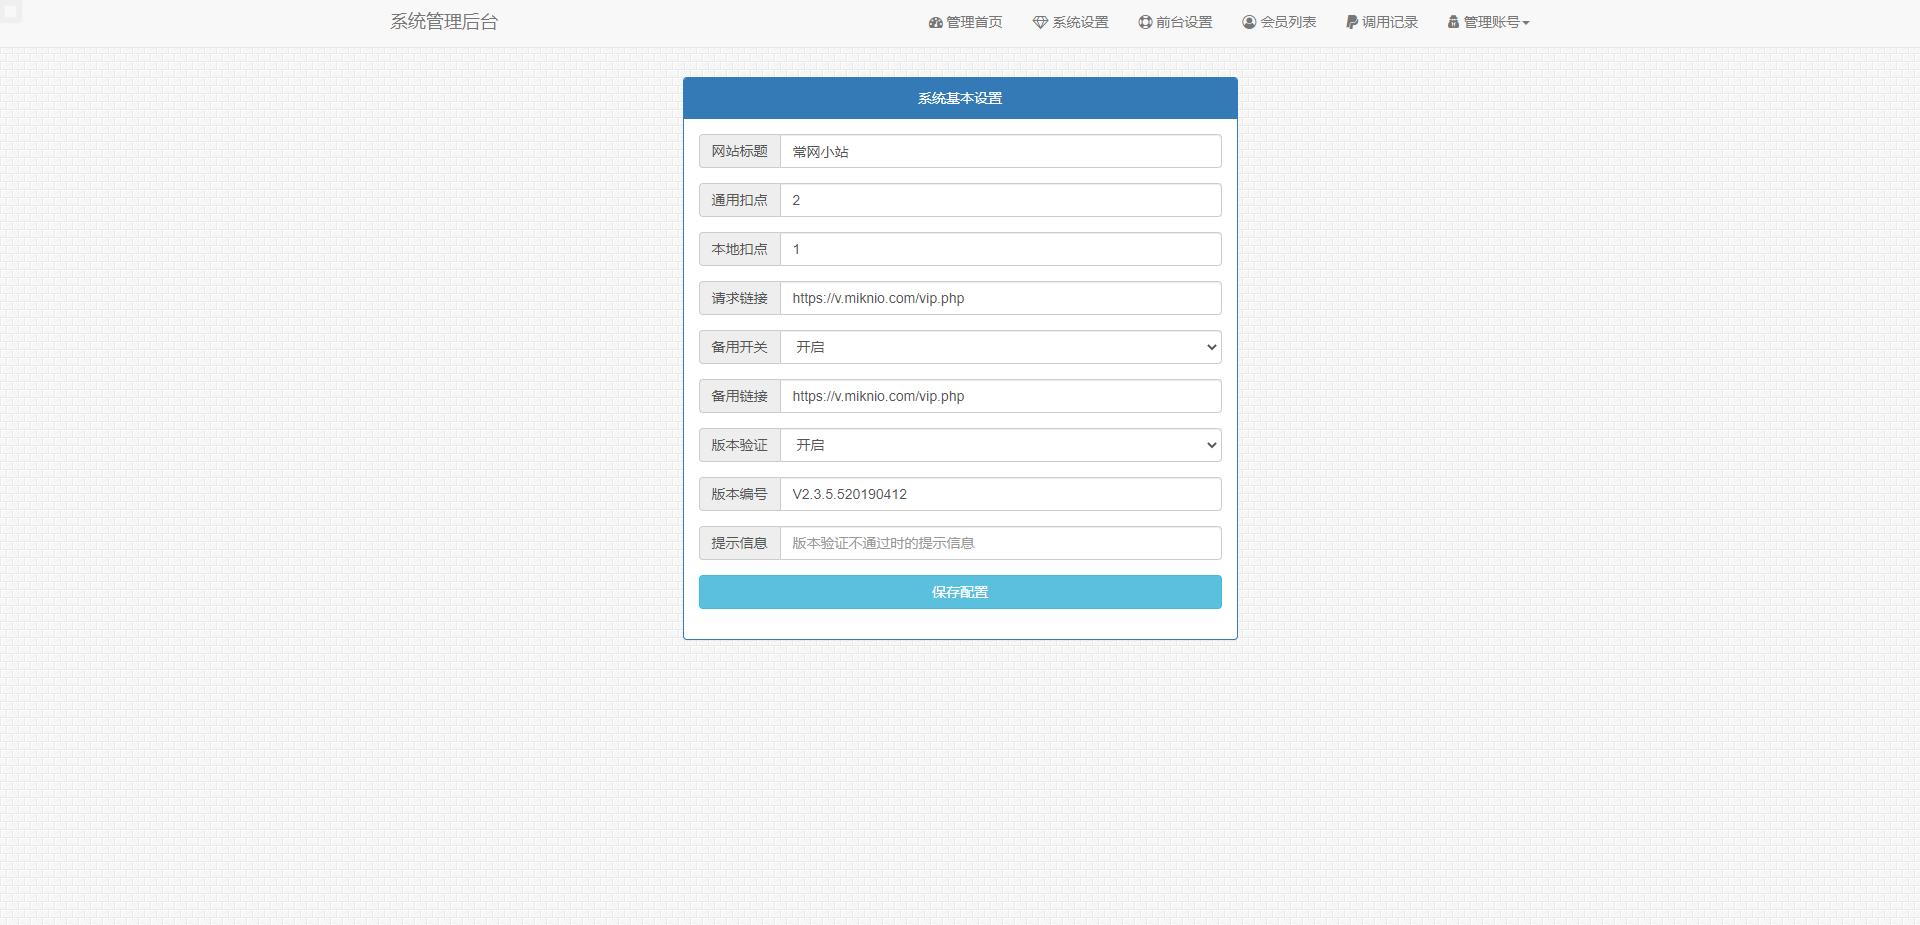 视频解析全套源码VIP视频一次解析PHP源码-常网小站Miknio